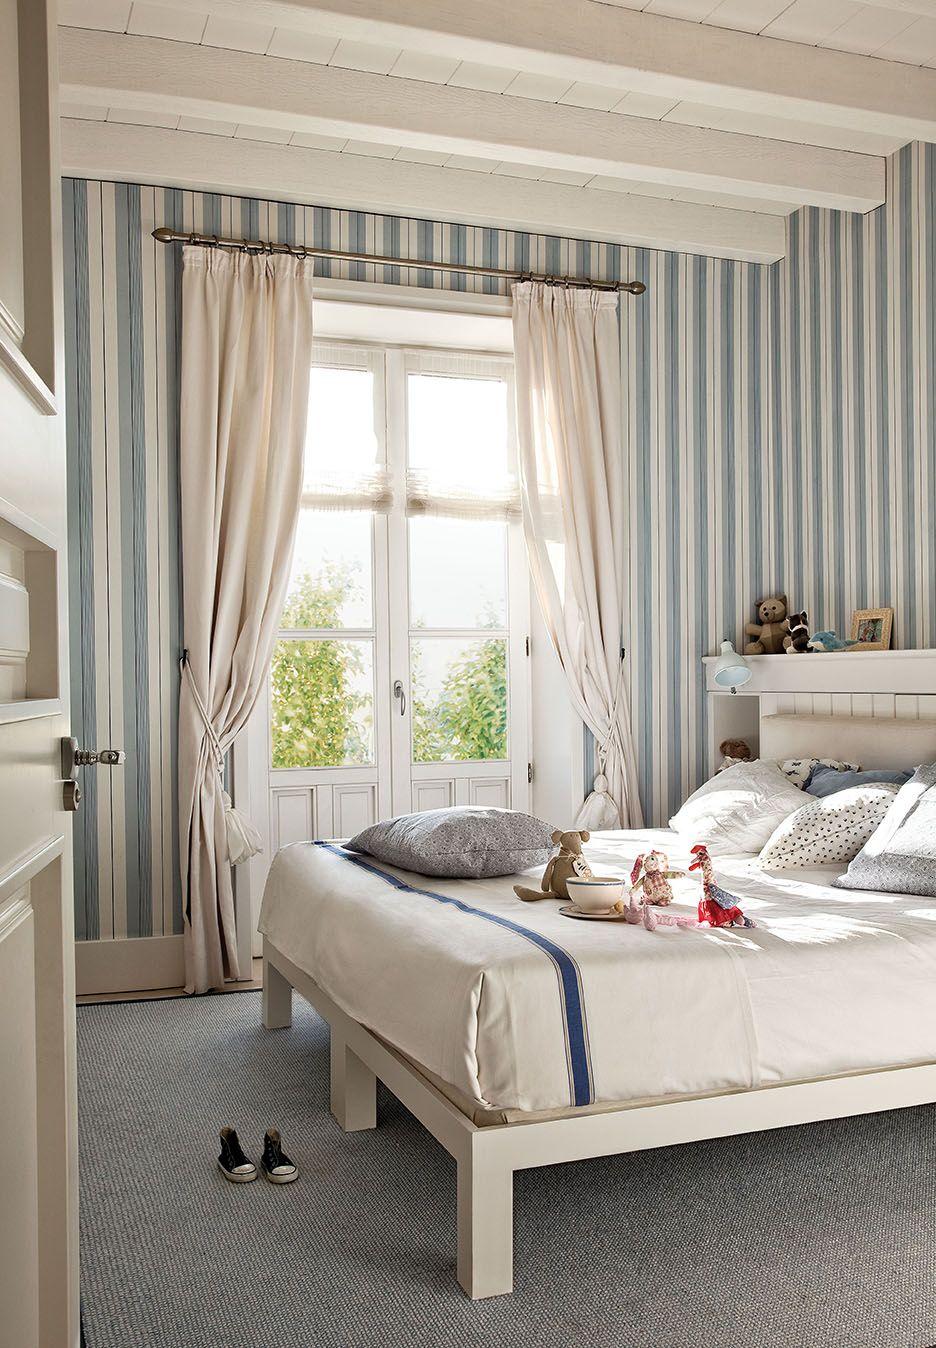 Dormitorio infantil deco papel pintado rayas for Dormitorios pintados en gris